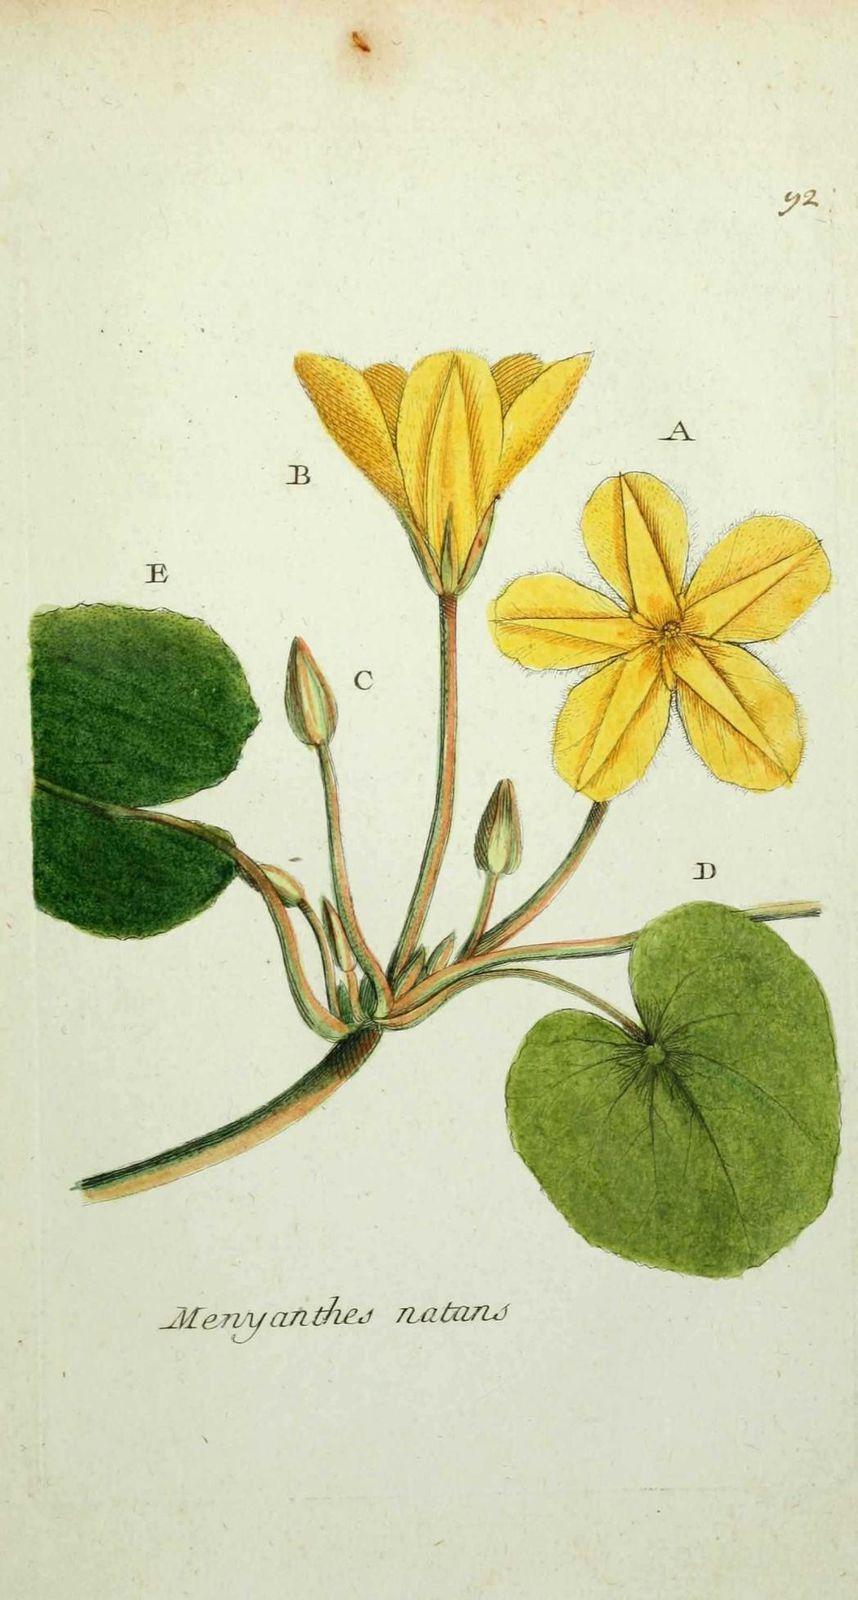 menyanthe a feuilles rondes - menyanthes nymphoides ( petit